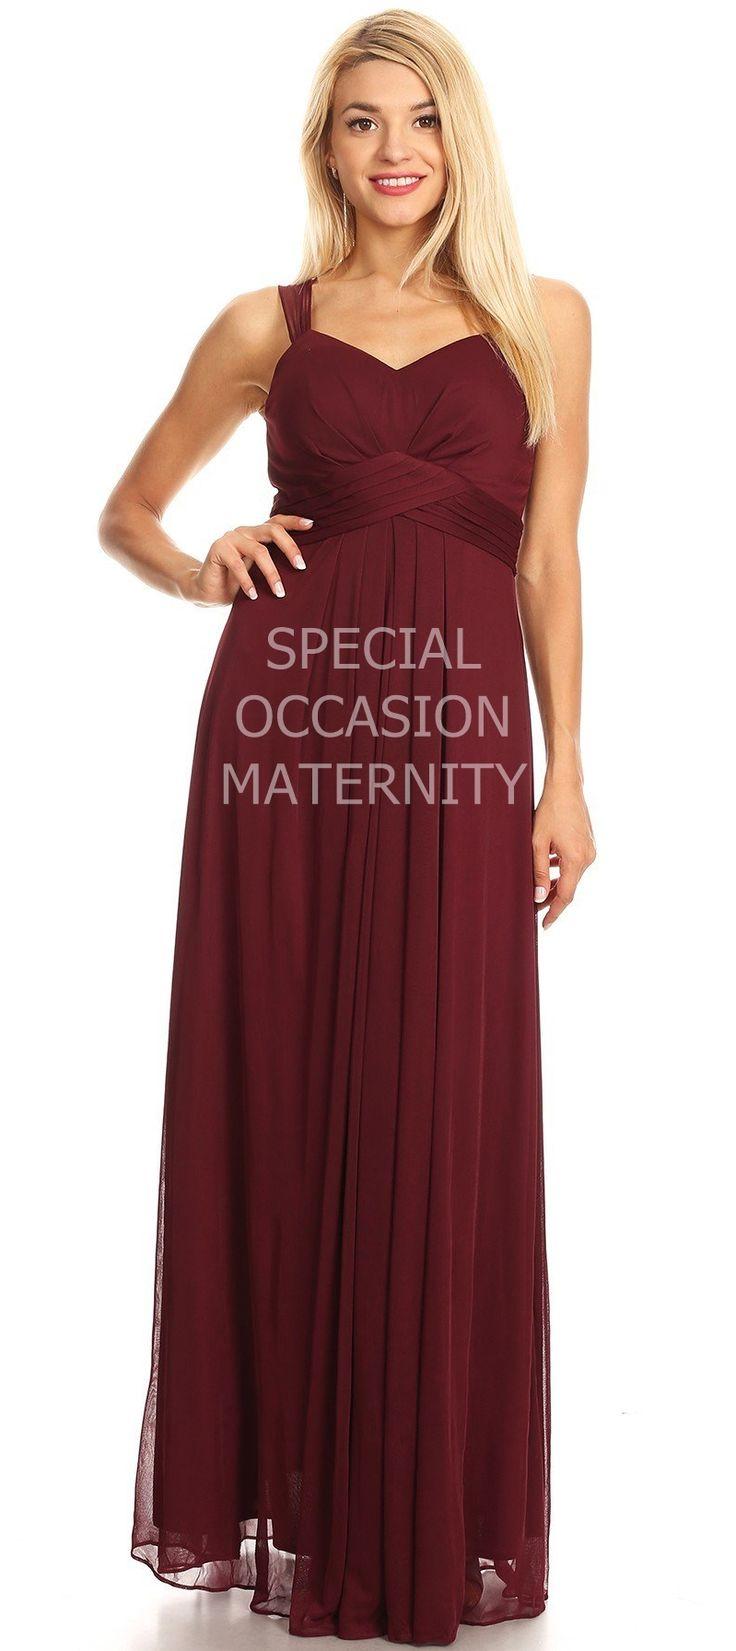 204 best maternity dresses images on pinterest maternity dresses fall wine maternity bridesmaids dress ombrellifo Images